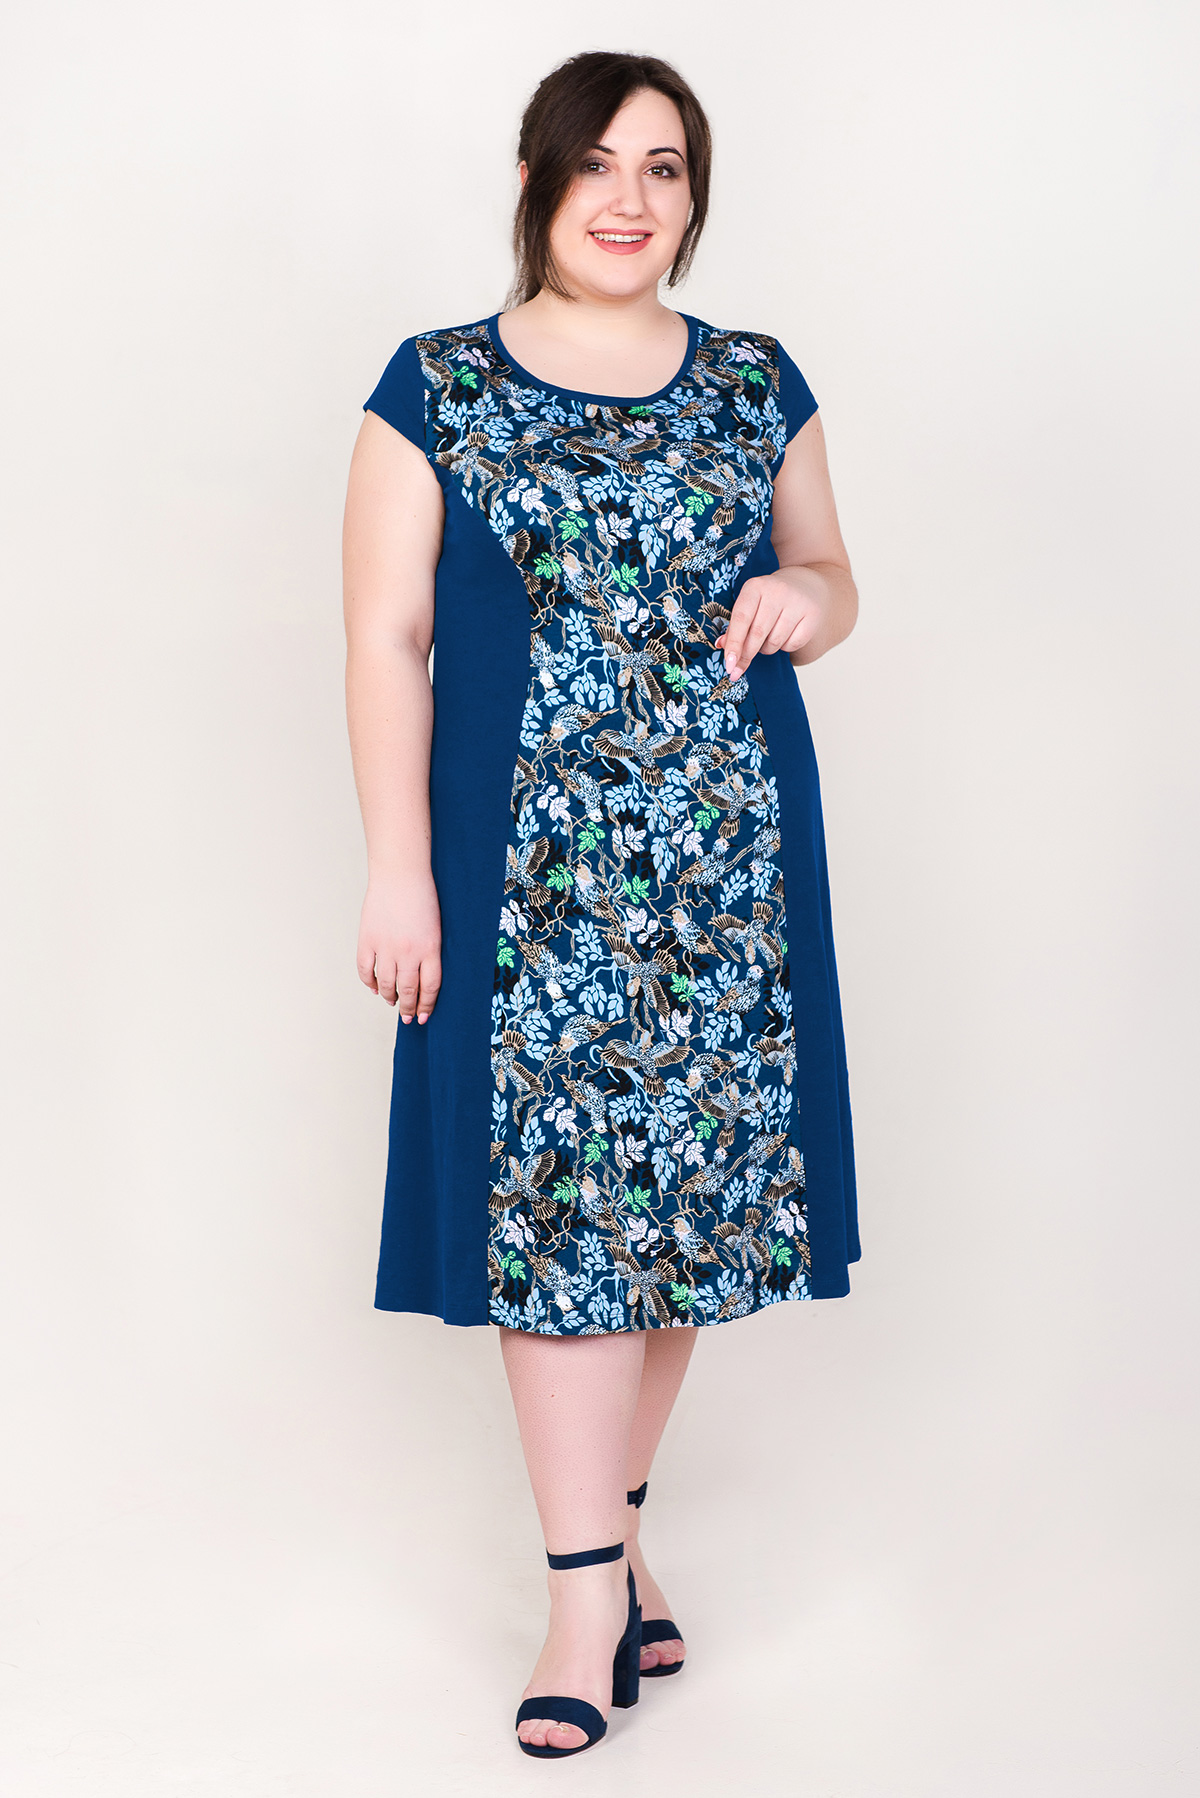 Жен. платье арт. 19-0278 Индиго р. 50 фото